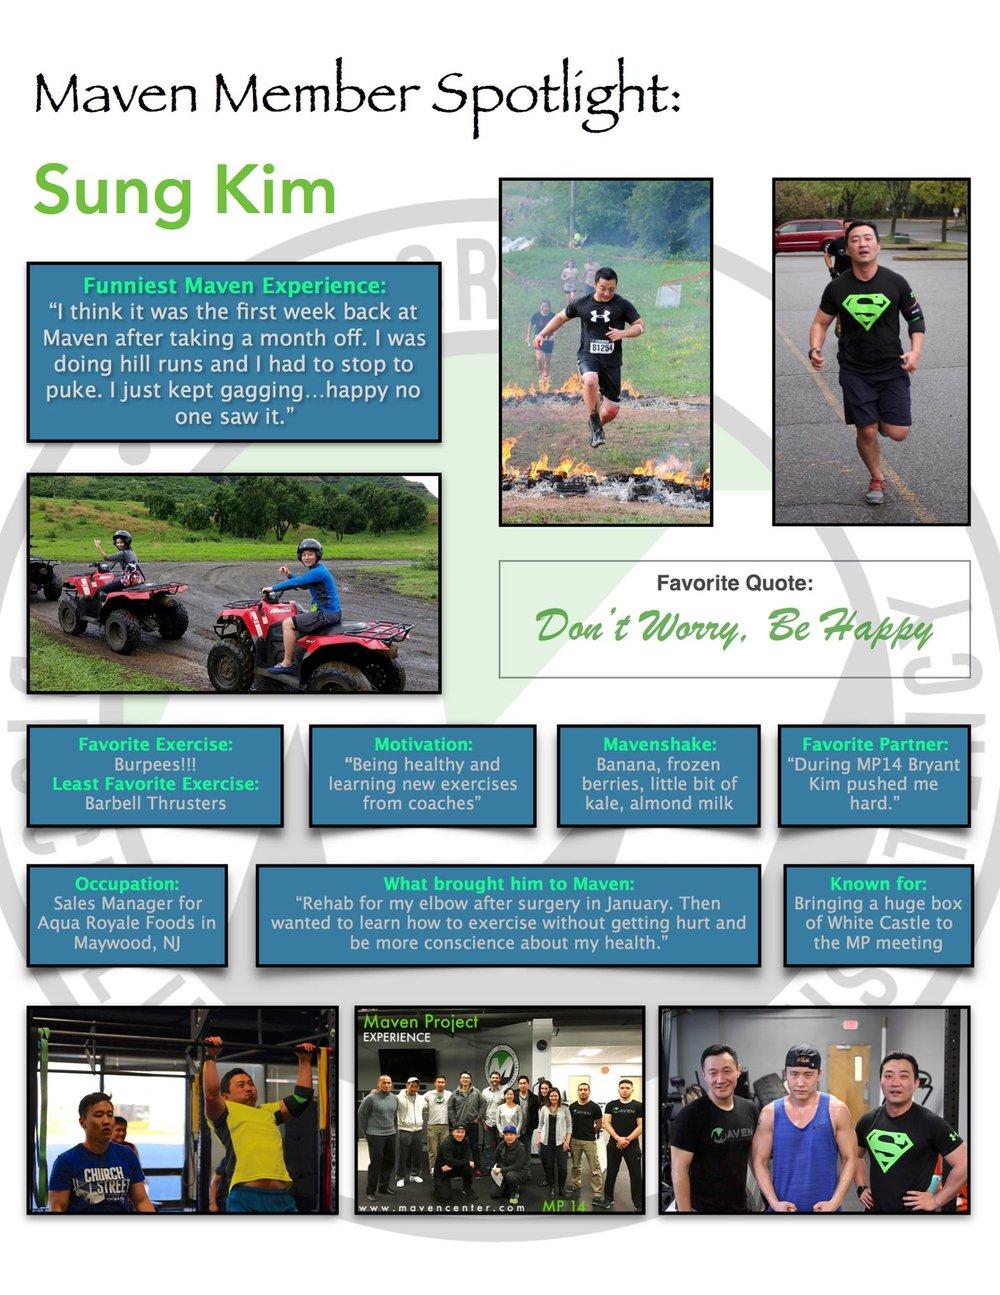 Sung Kim's Spotlight